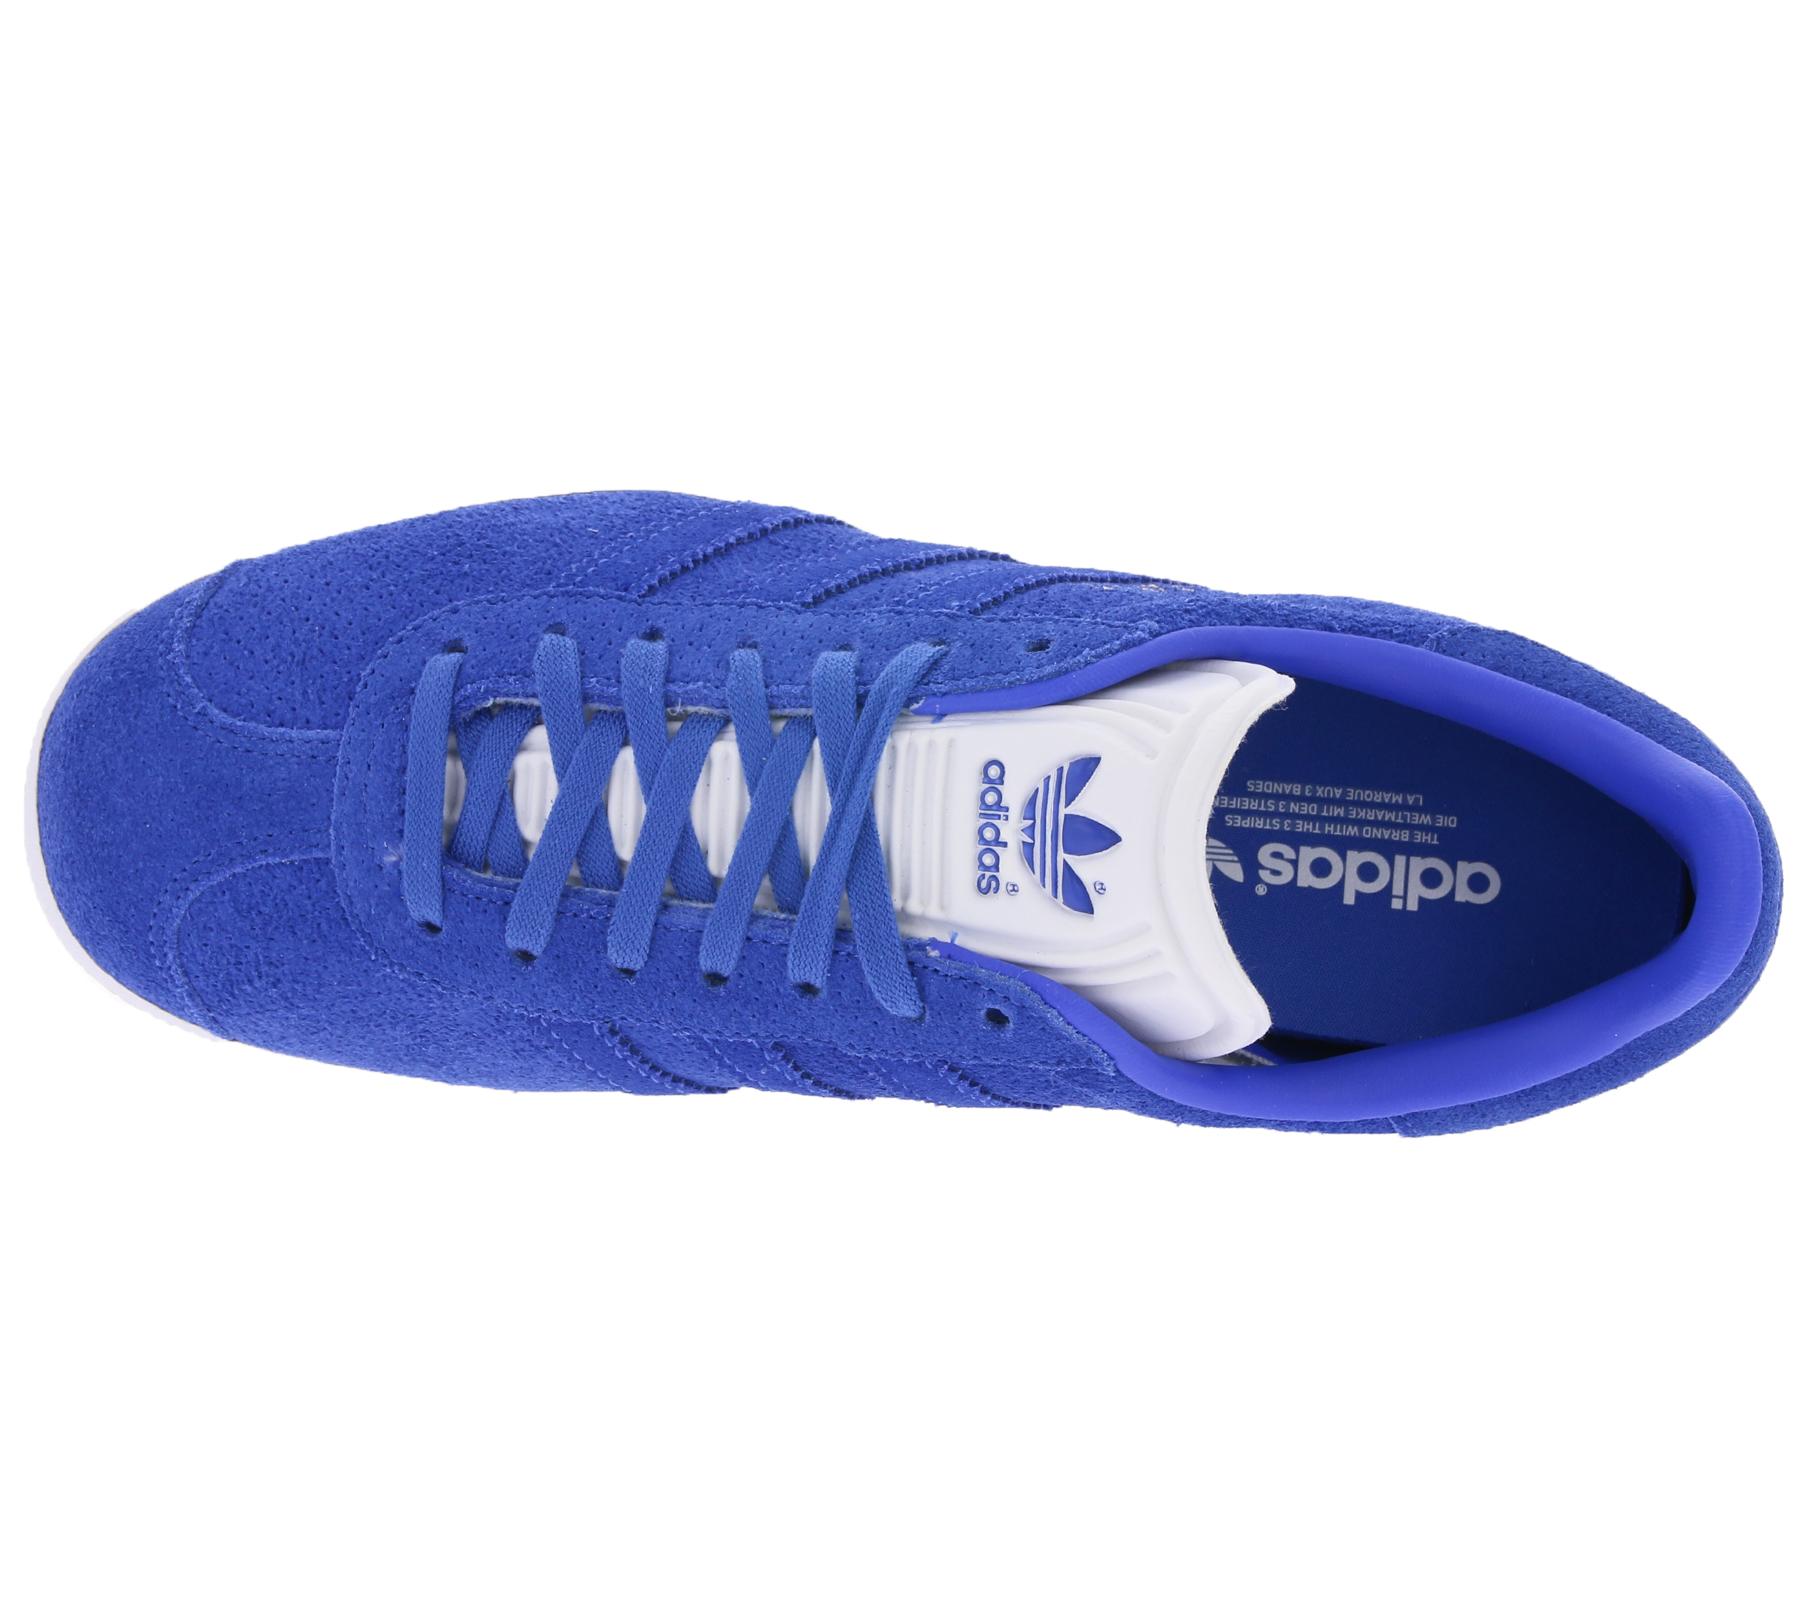 Schuhe Sneaker Originals Blau Adidas Gazelle Damen Coole